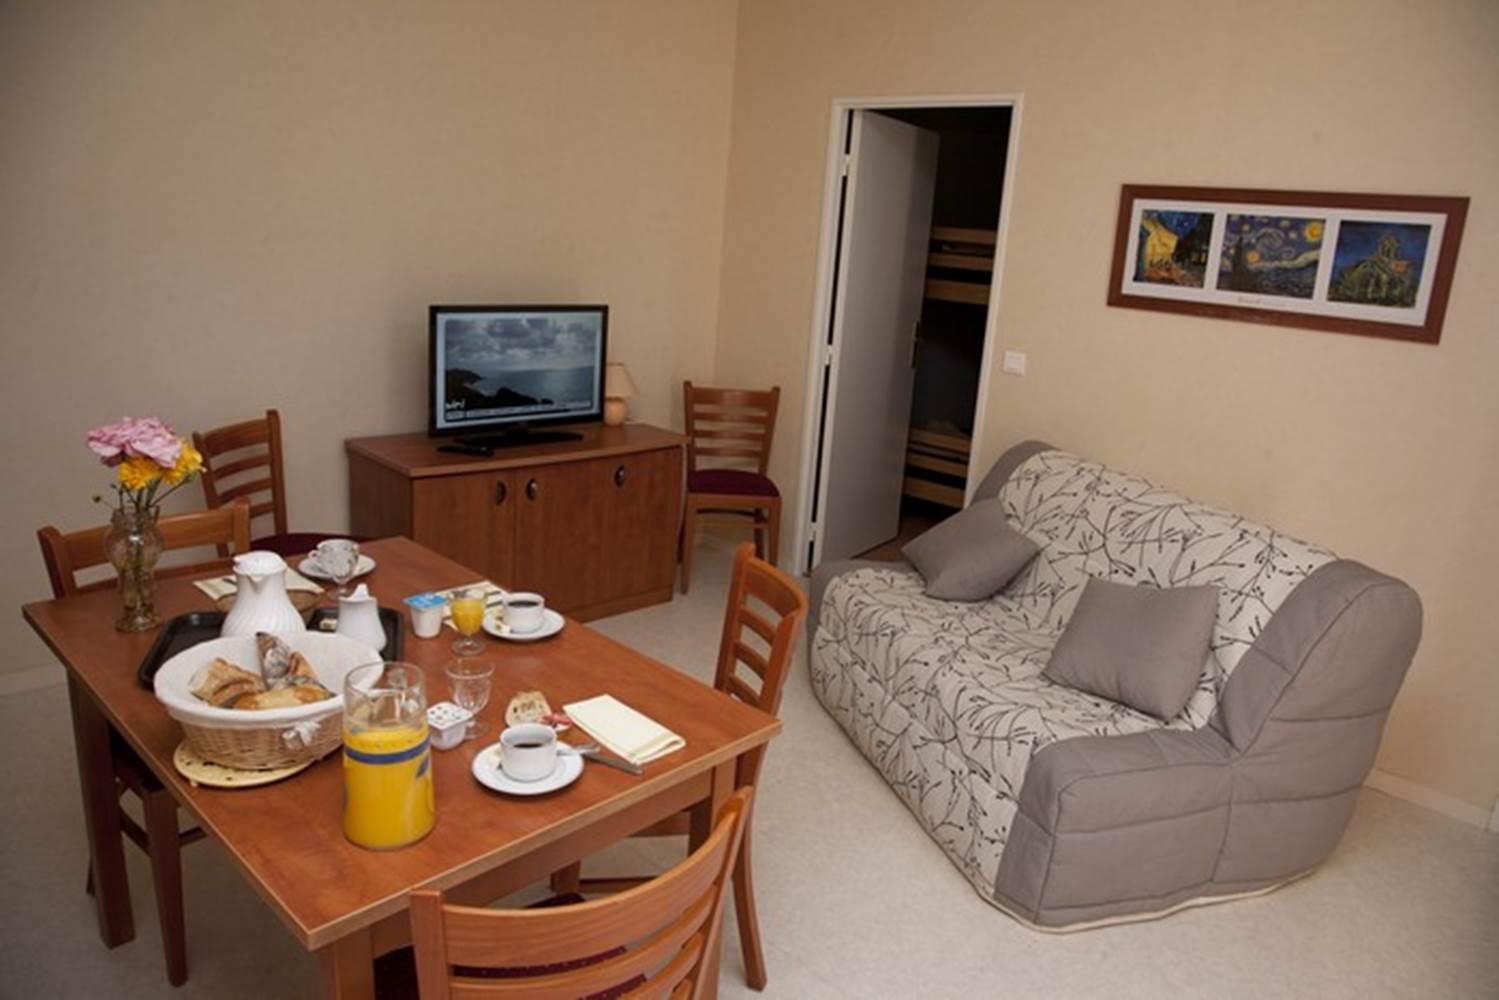 AR PEOC'H - Appartement - Morbihan - Bretagne Sud © MATHURIN